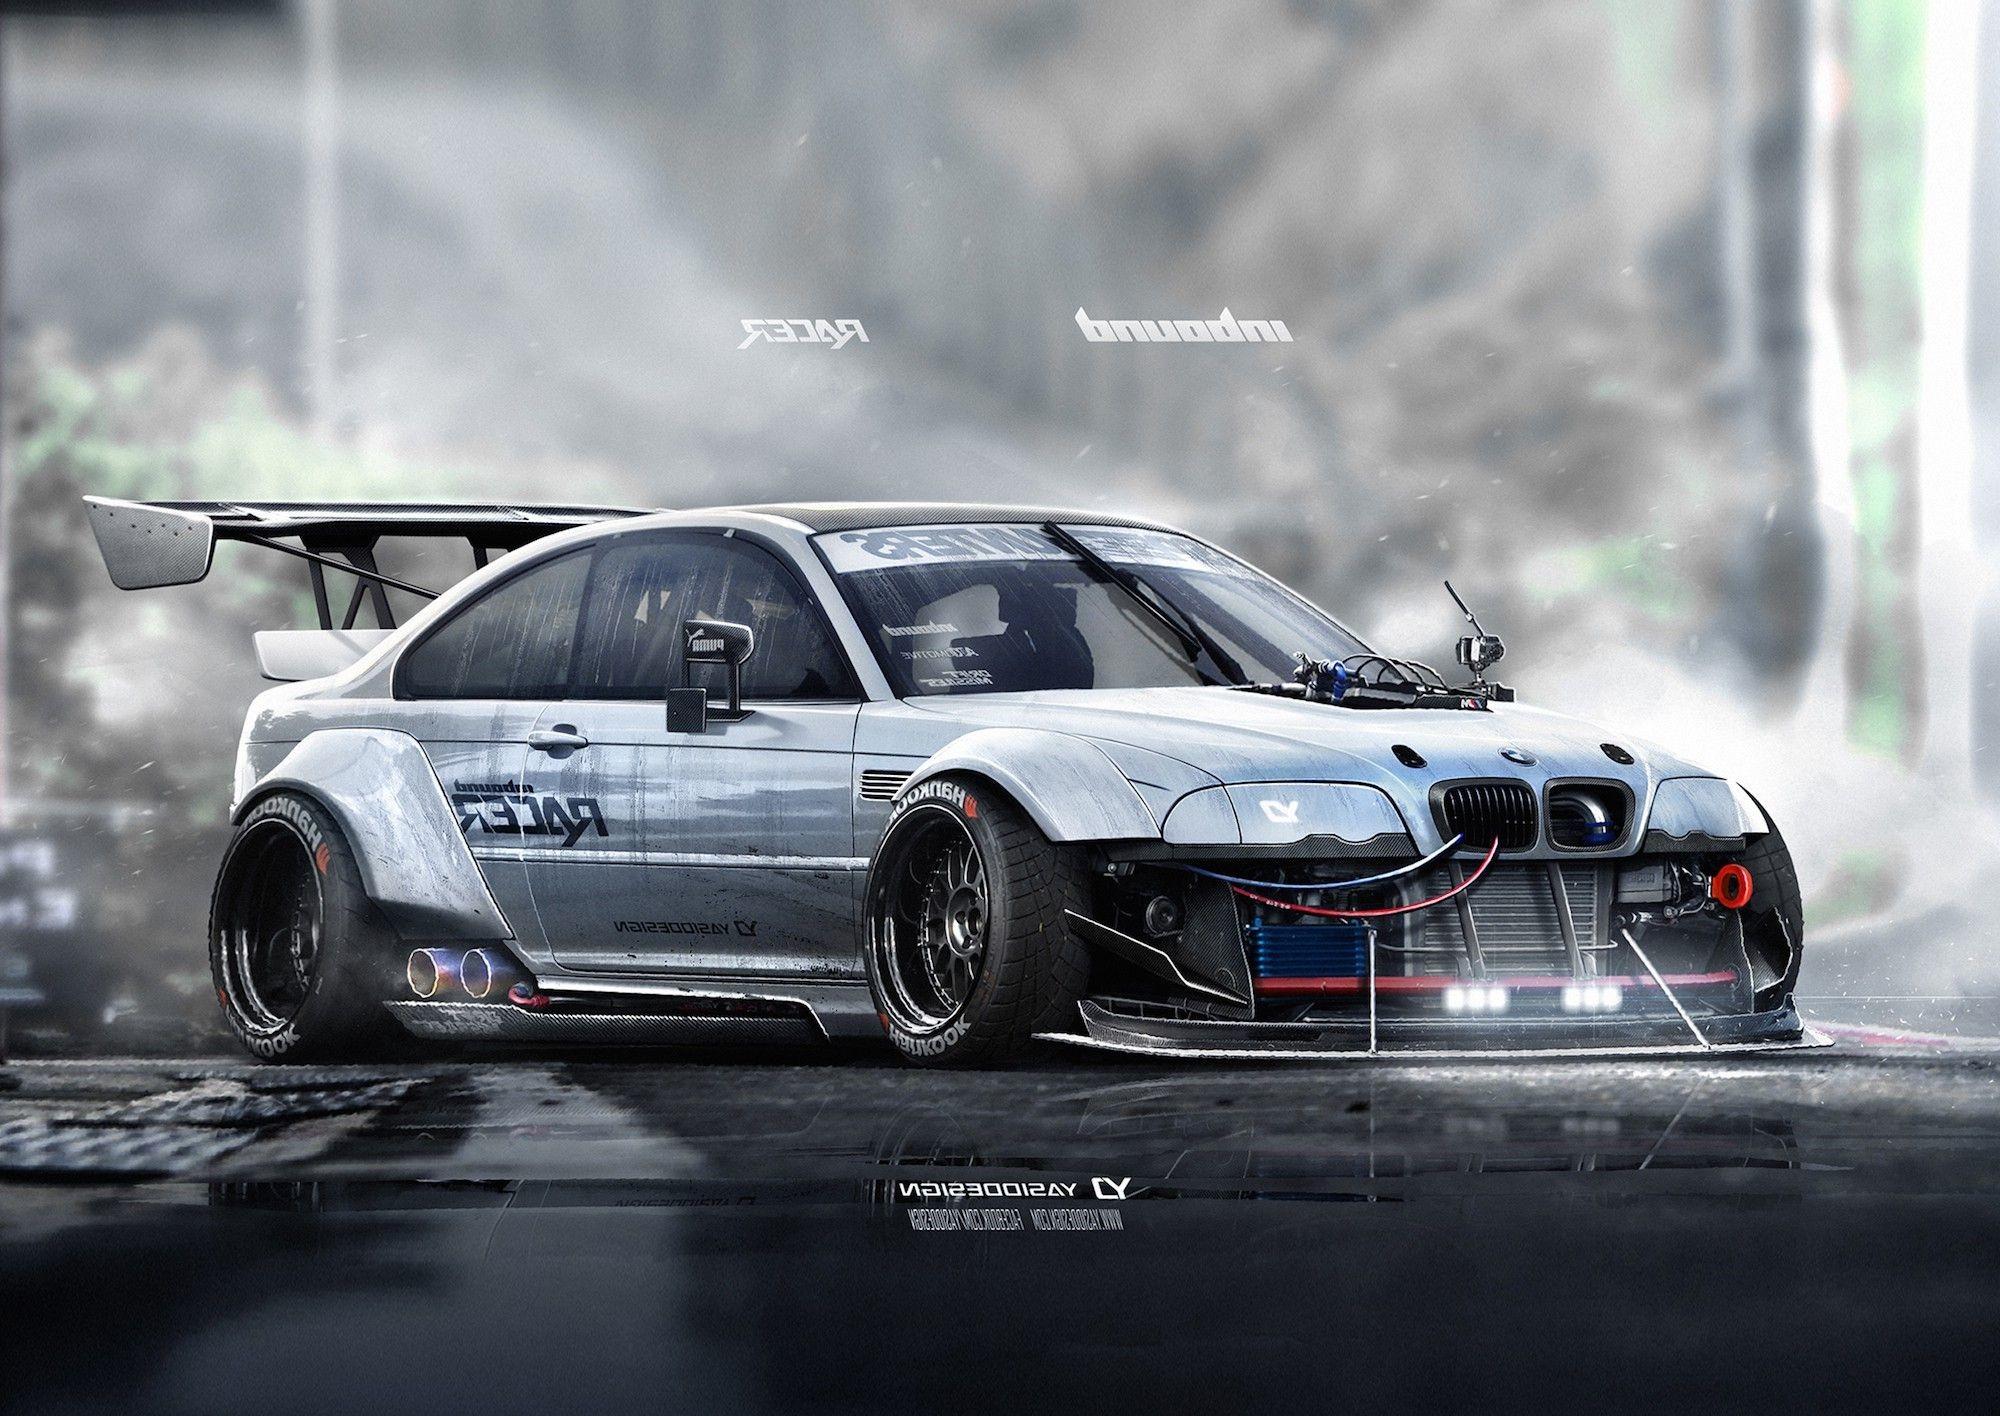 Res: 2000x1416, Car Yasiddesign Render Artwork Bmw M3 E46 Race Cars